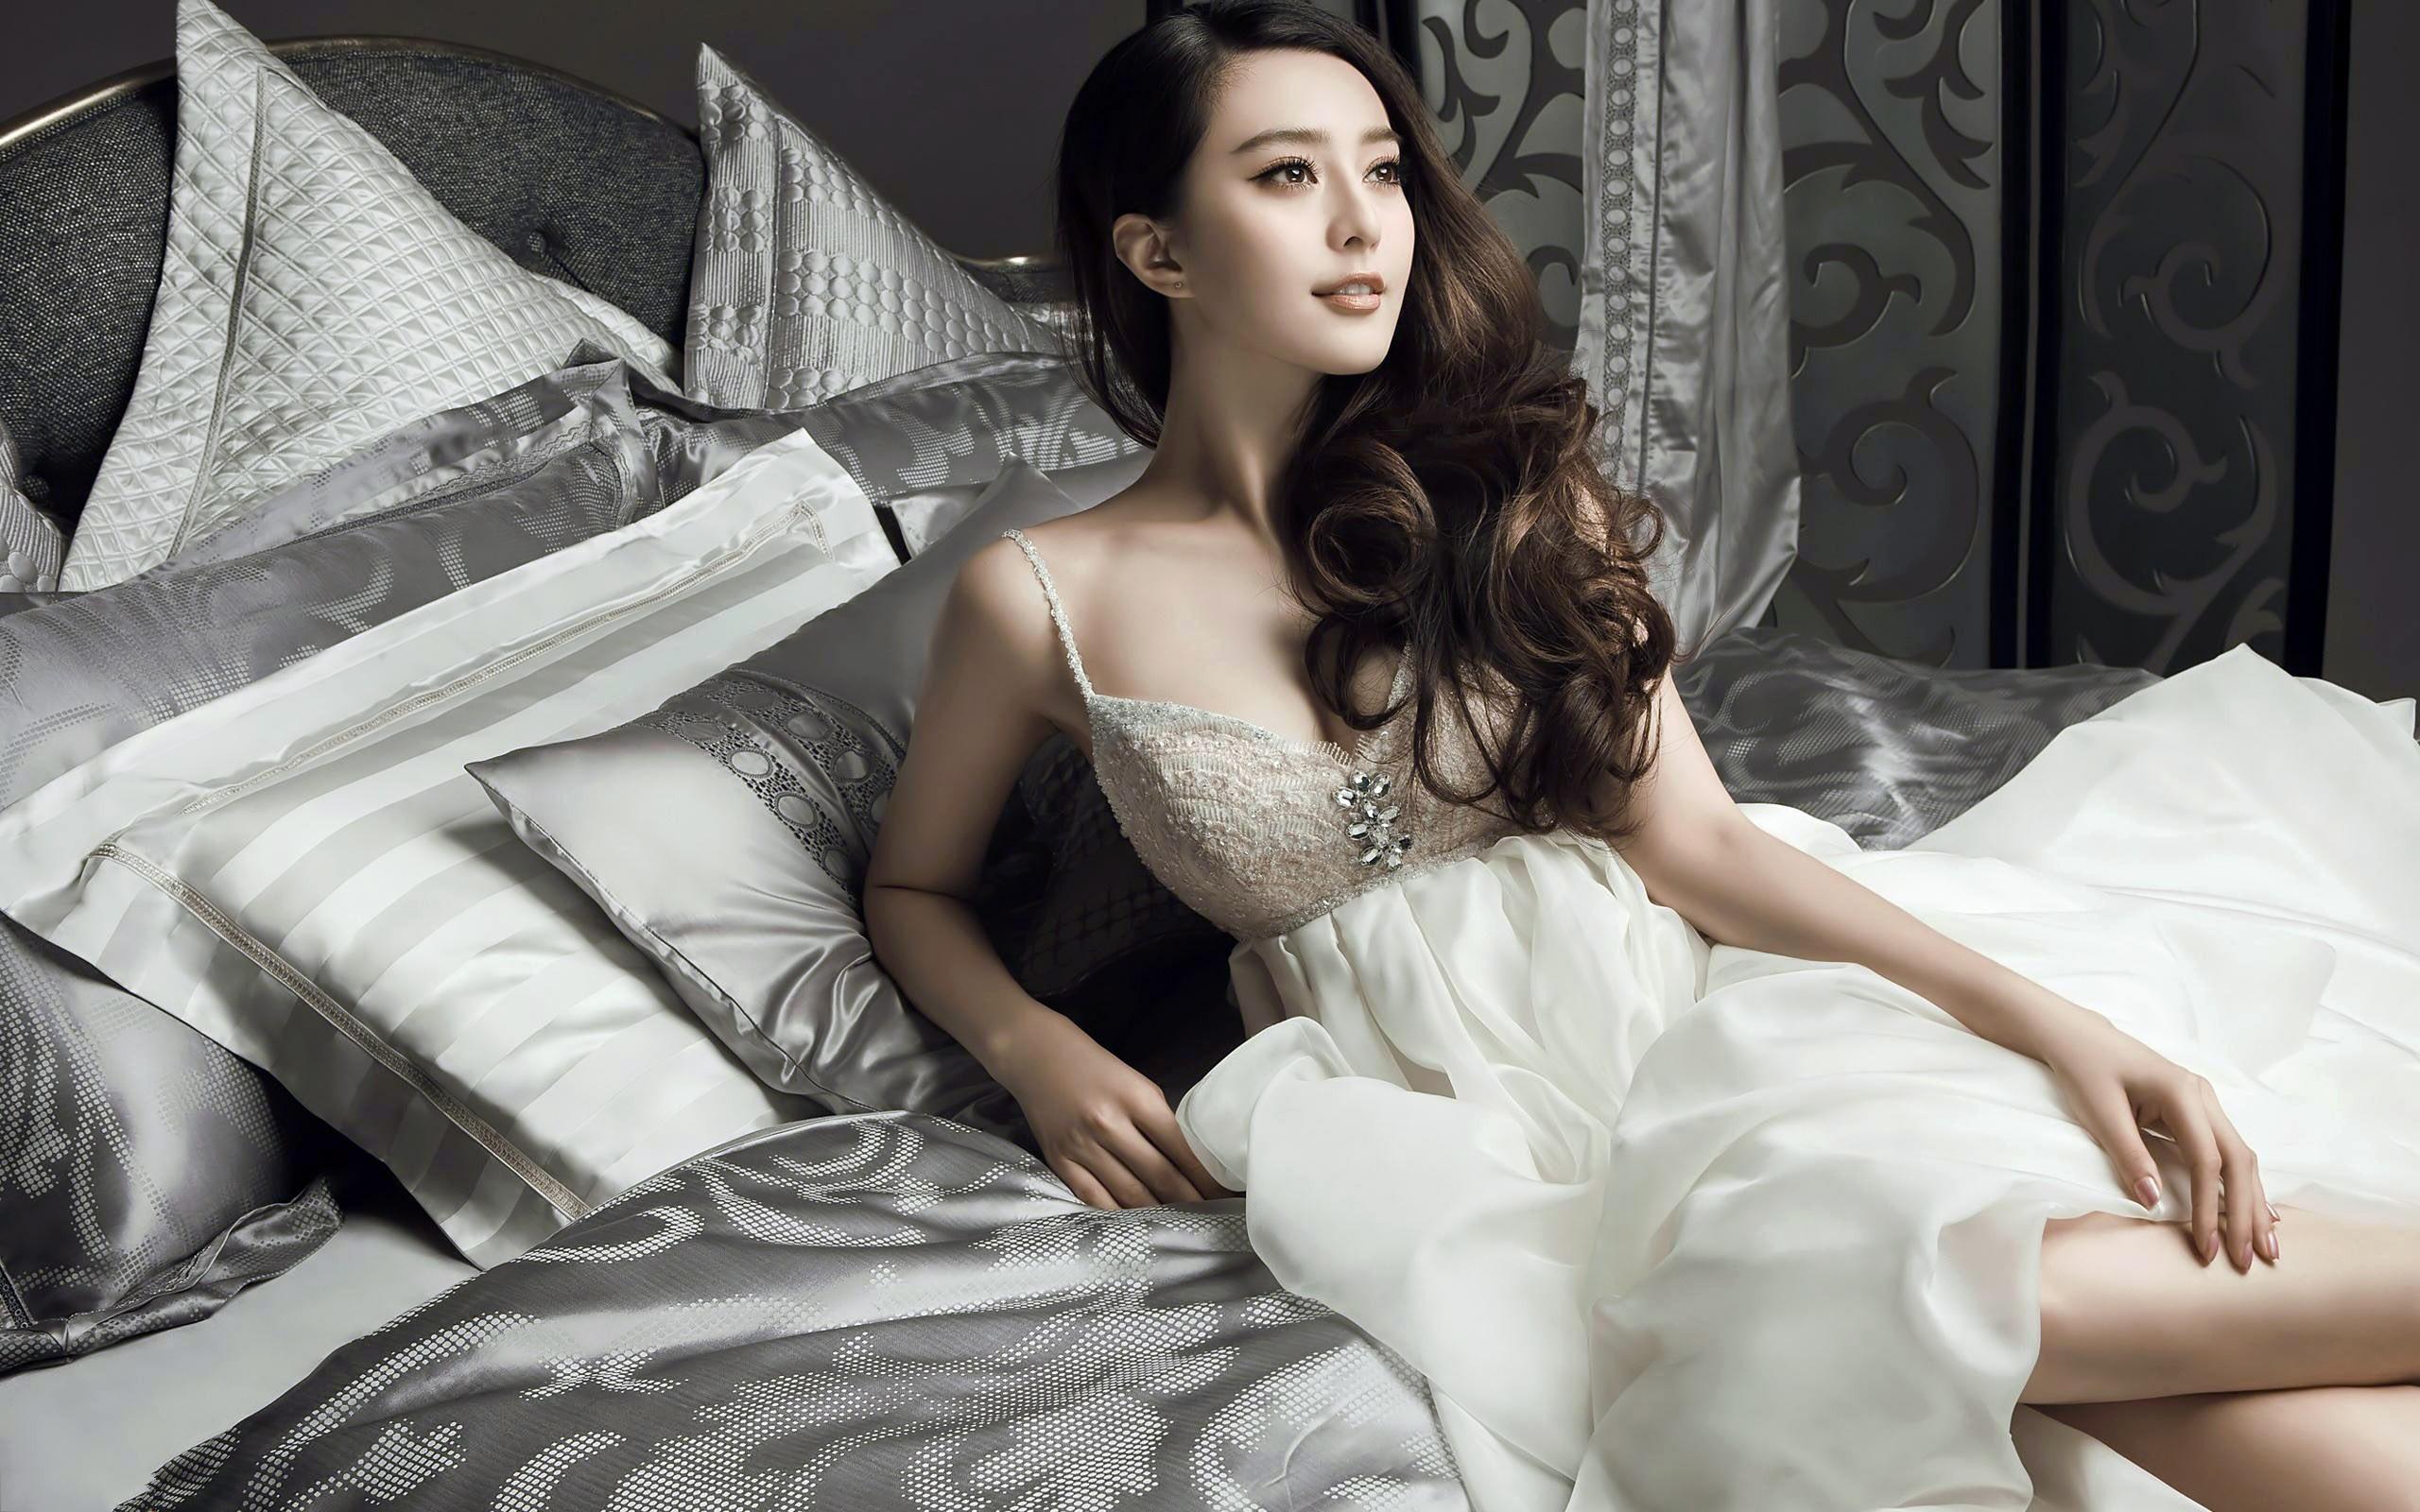 fan bingbing actress, hd celebrities, 4k wallpapers, images